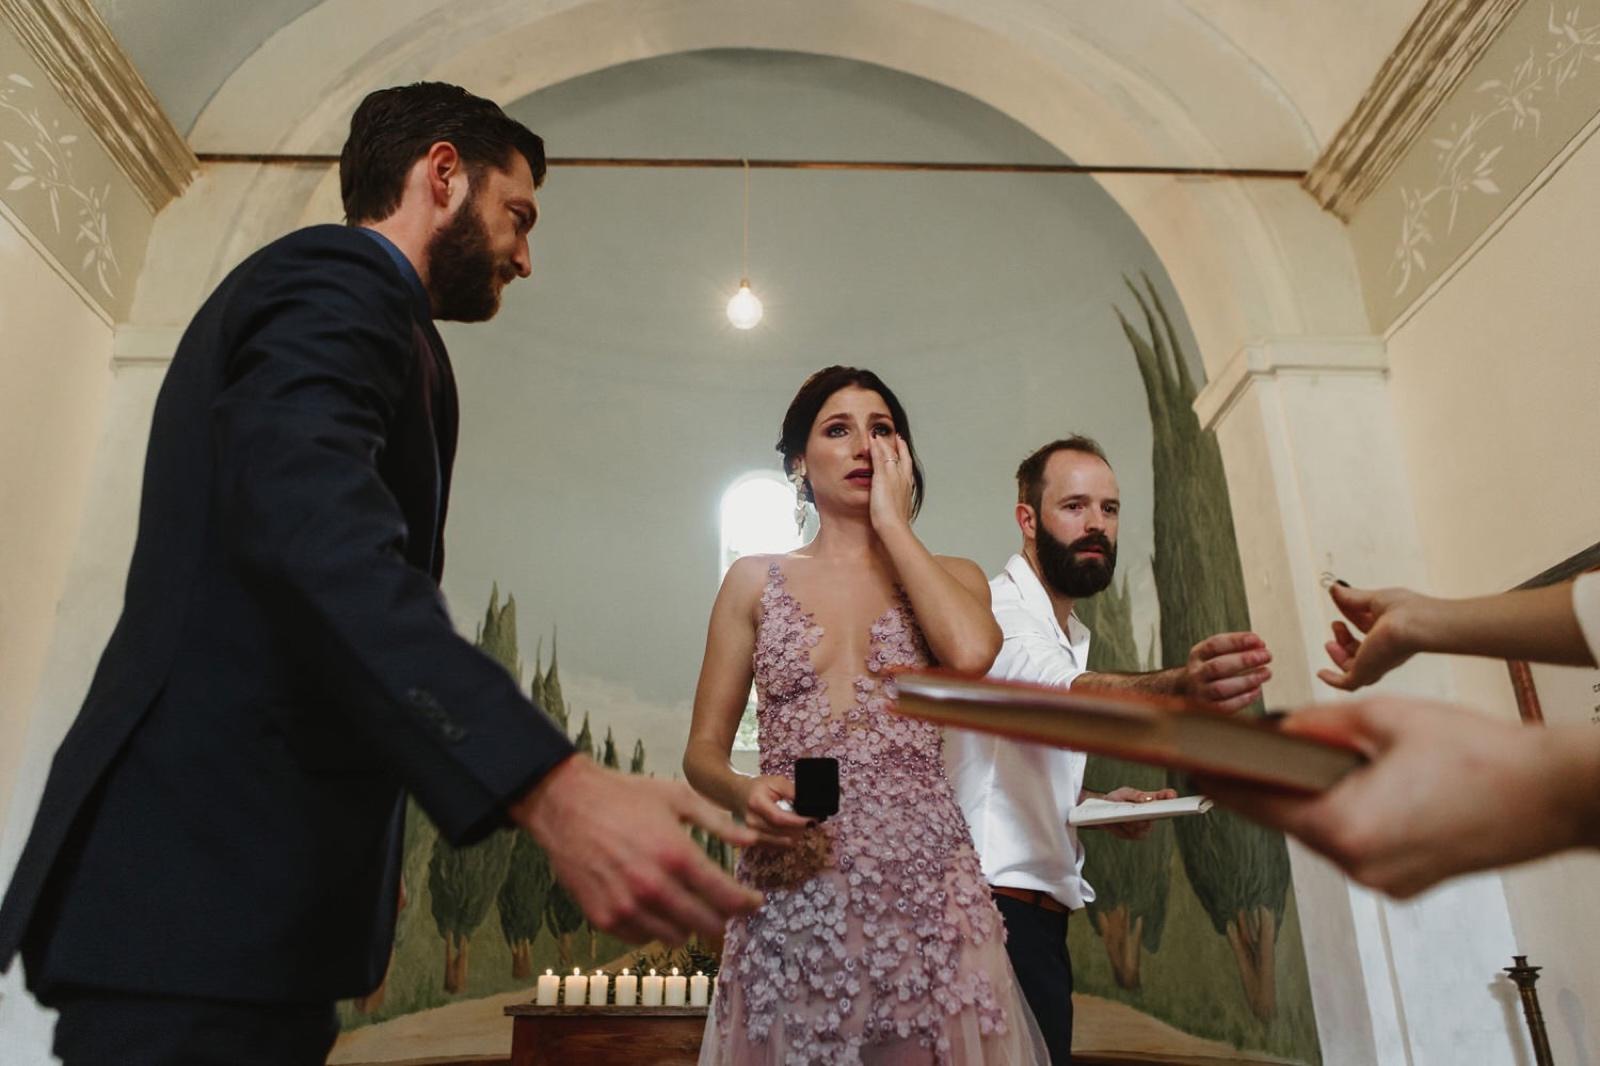 Fotomagoria Best 0f 2018 Wedding Photographer Italy71.jpg